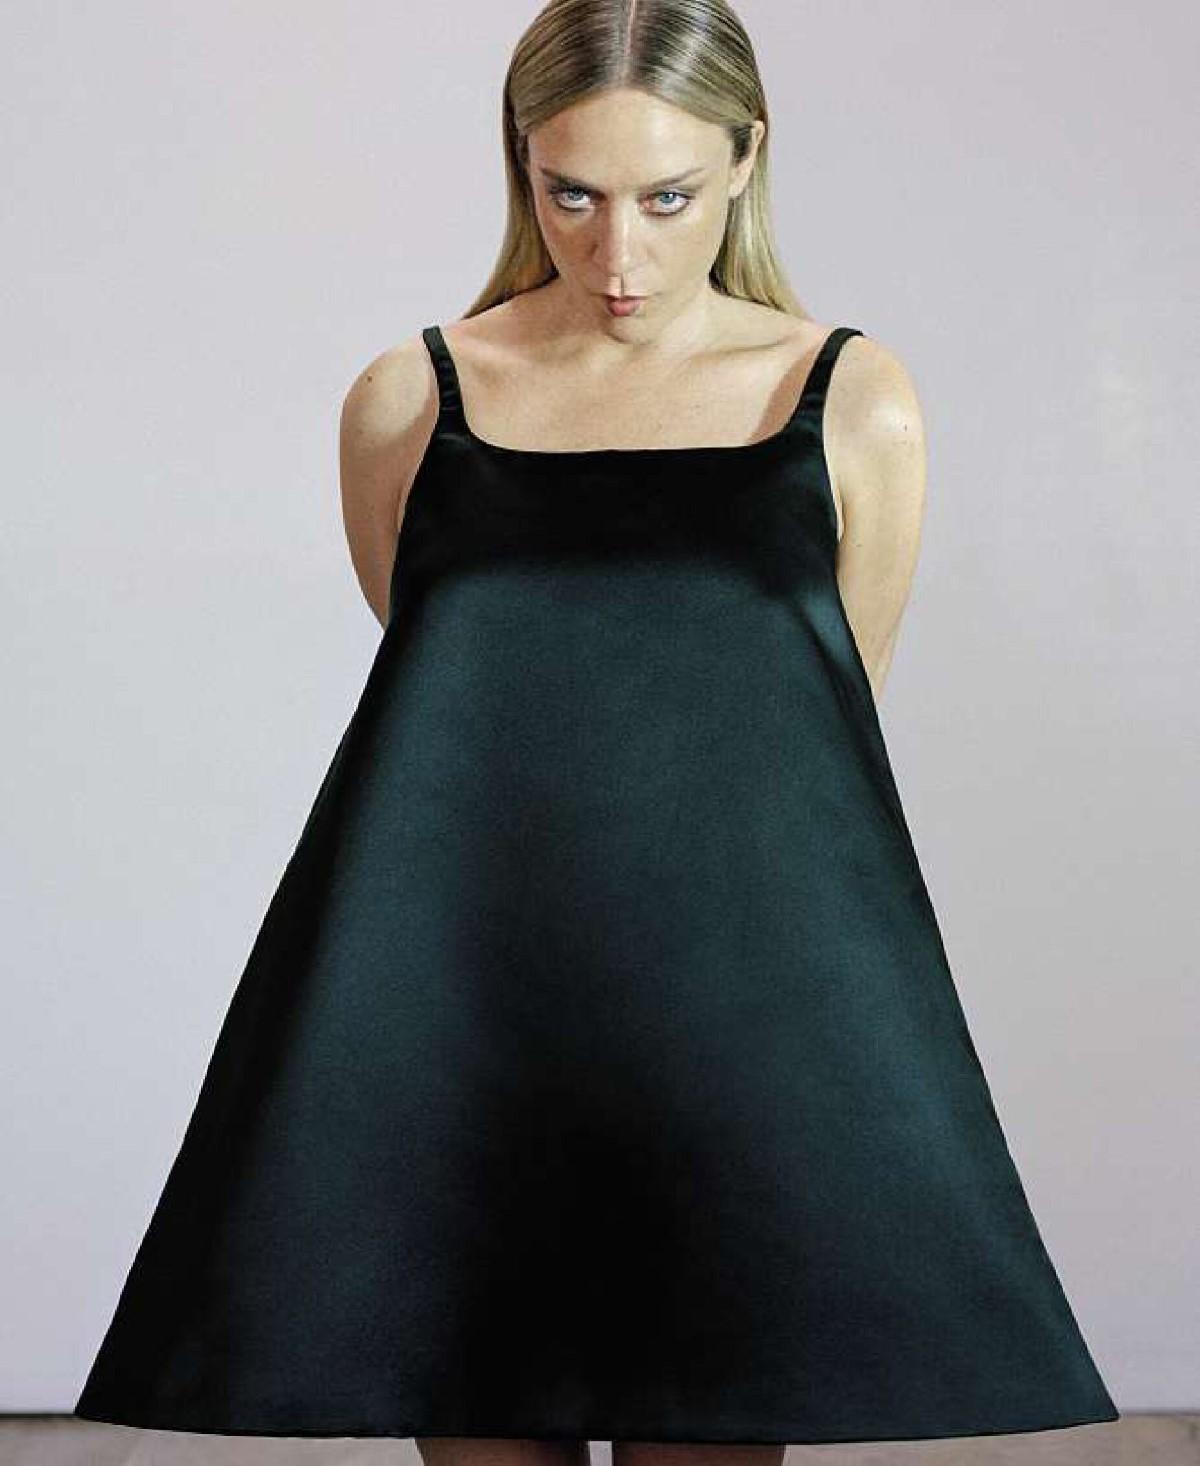 Chloe-Sevigny-Briana-Capozzi-M-Le-Monde- (9).jpg